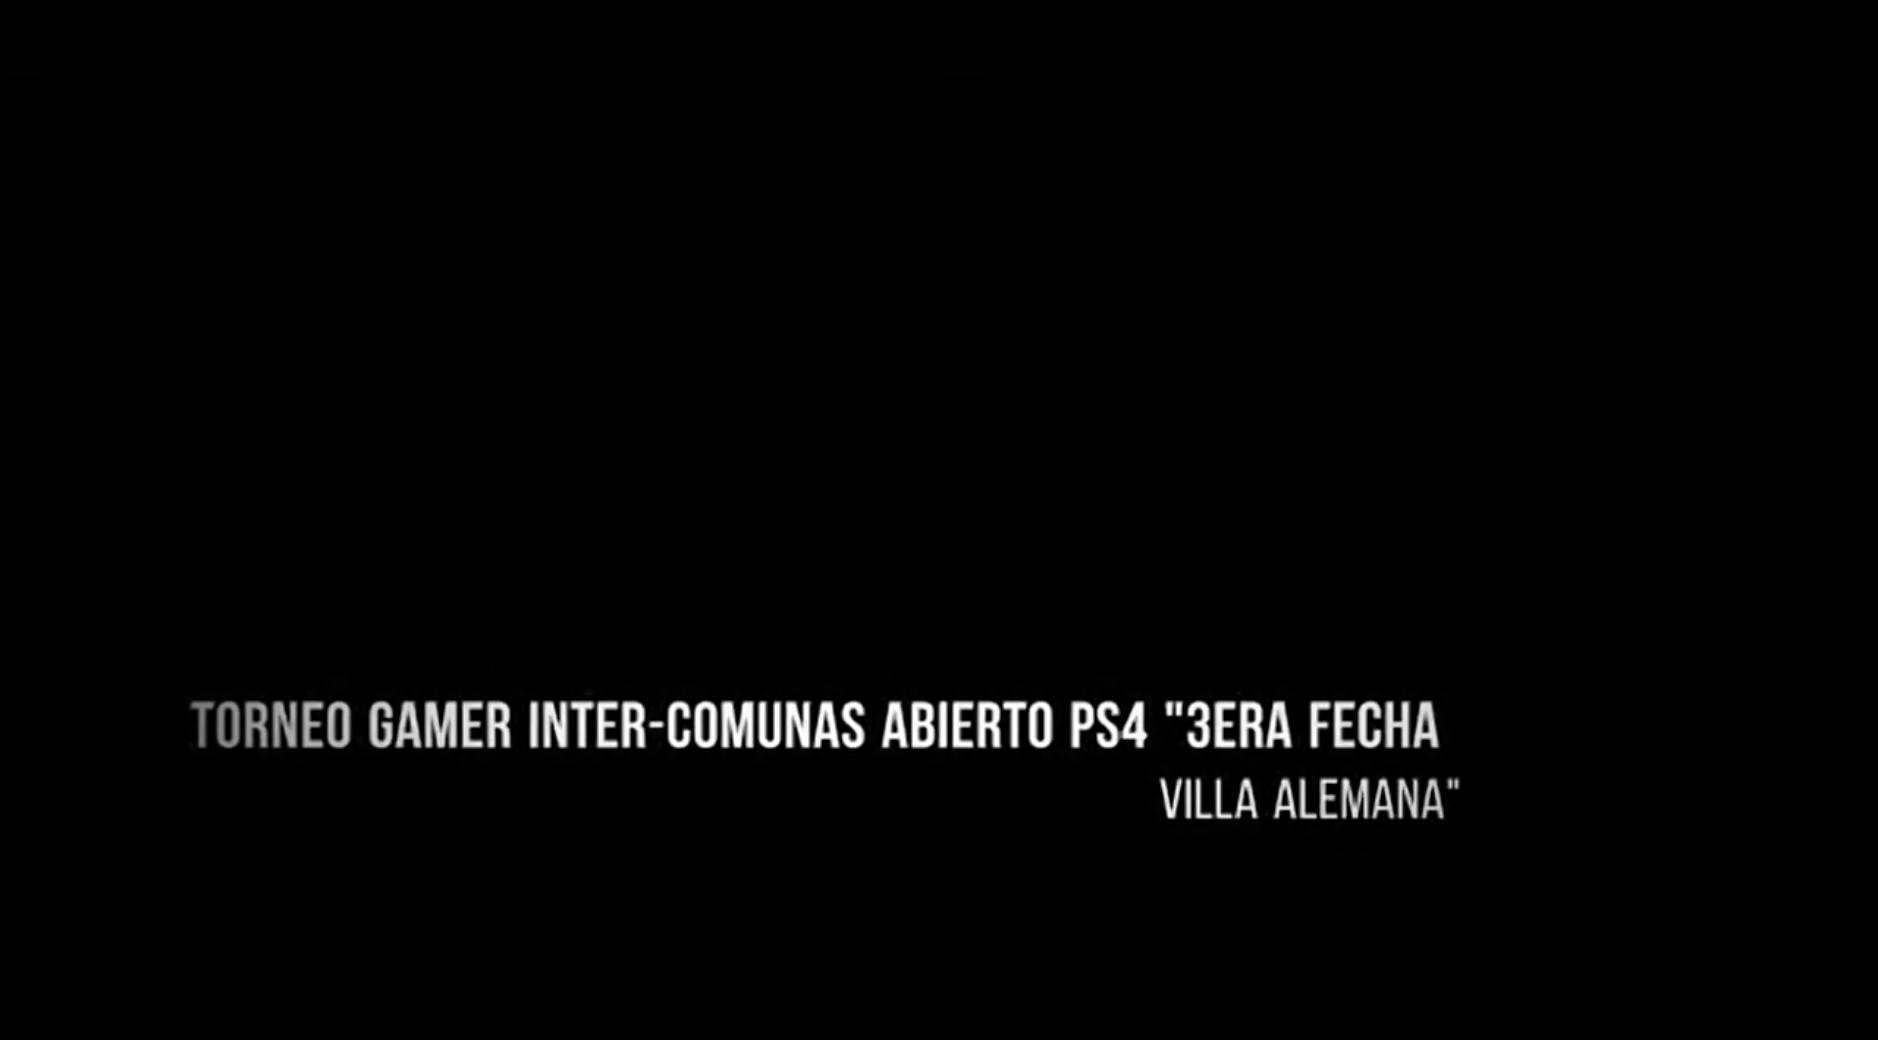 TORNEO GAMER INTER-COMUNAS ABIERTO PS4 VILLA ALEMANA